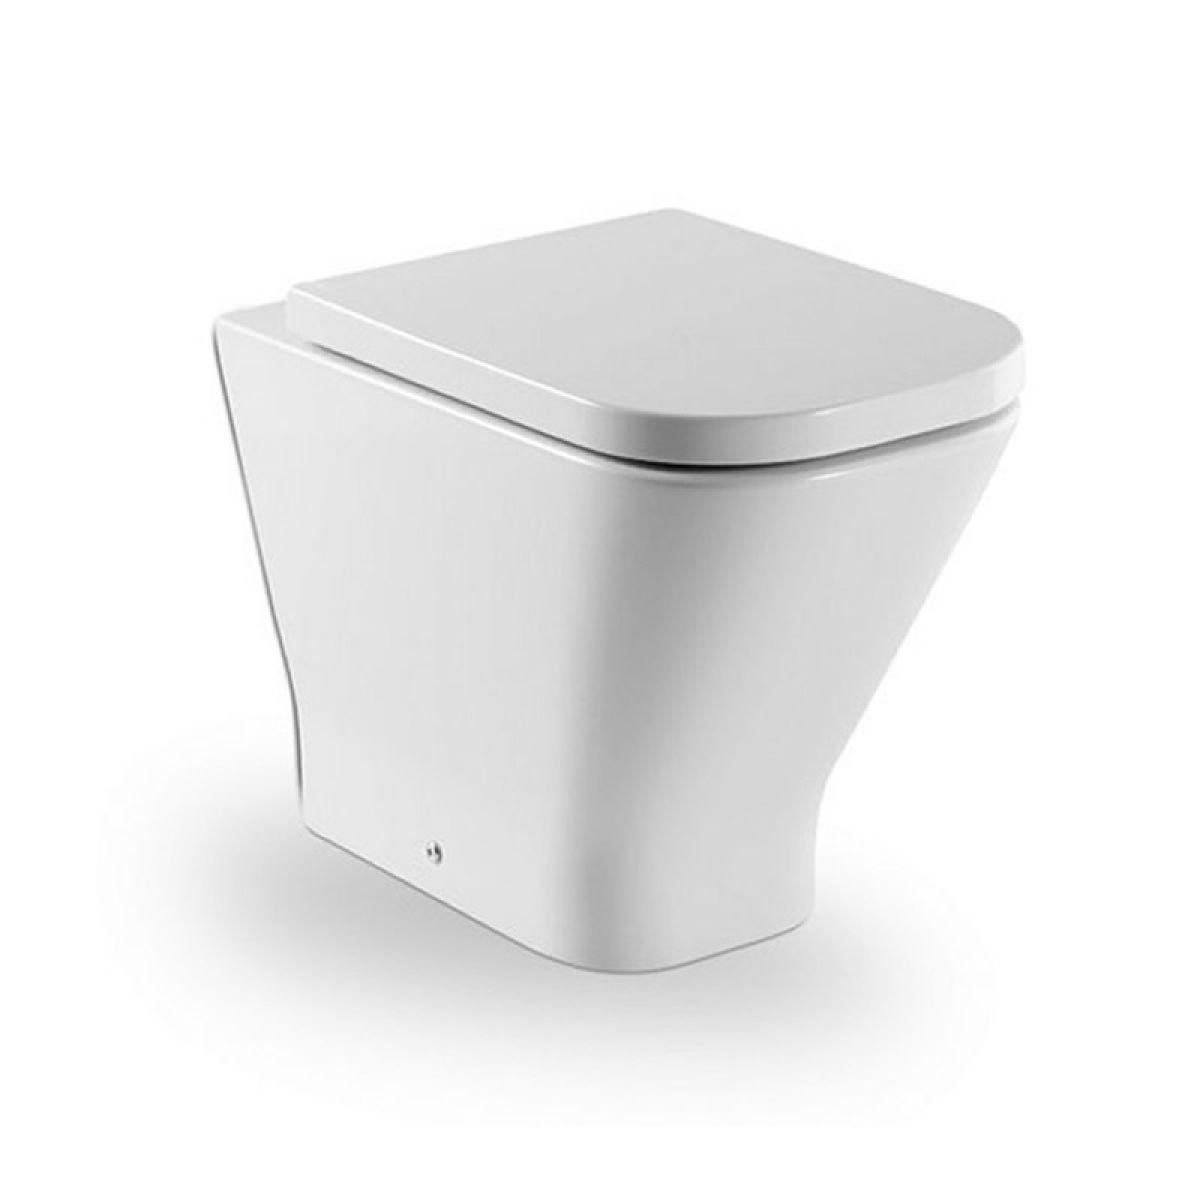 Roca The Gap Back To Wall Wc Pan Uk Bathrooms